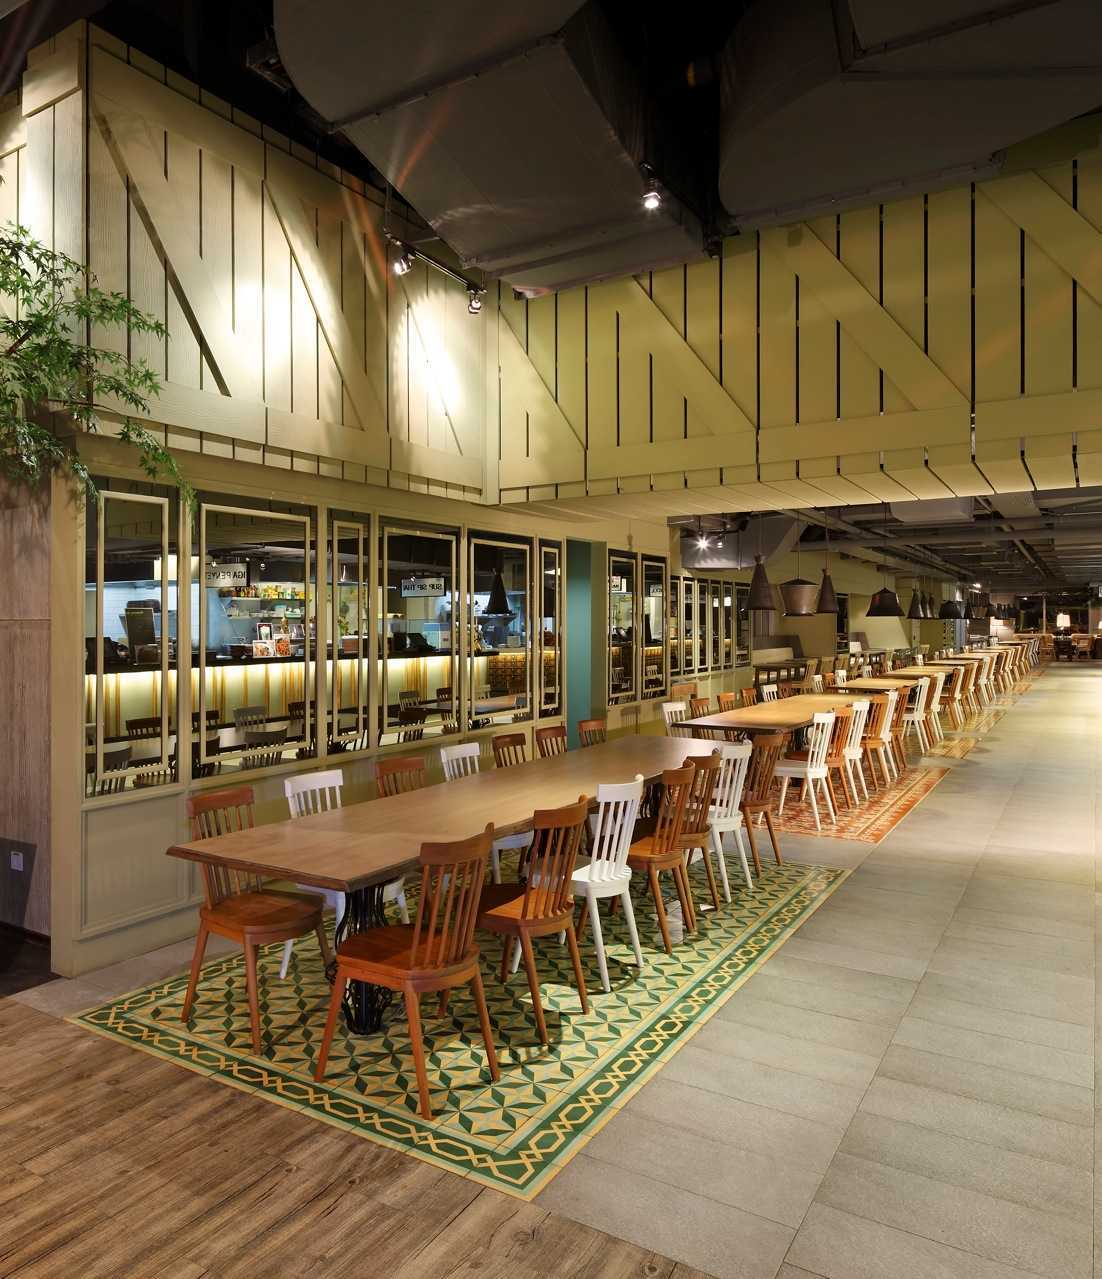 Project Urban Kitchen Desain Arsitek Oleh MA-RU